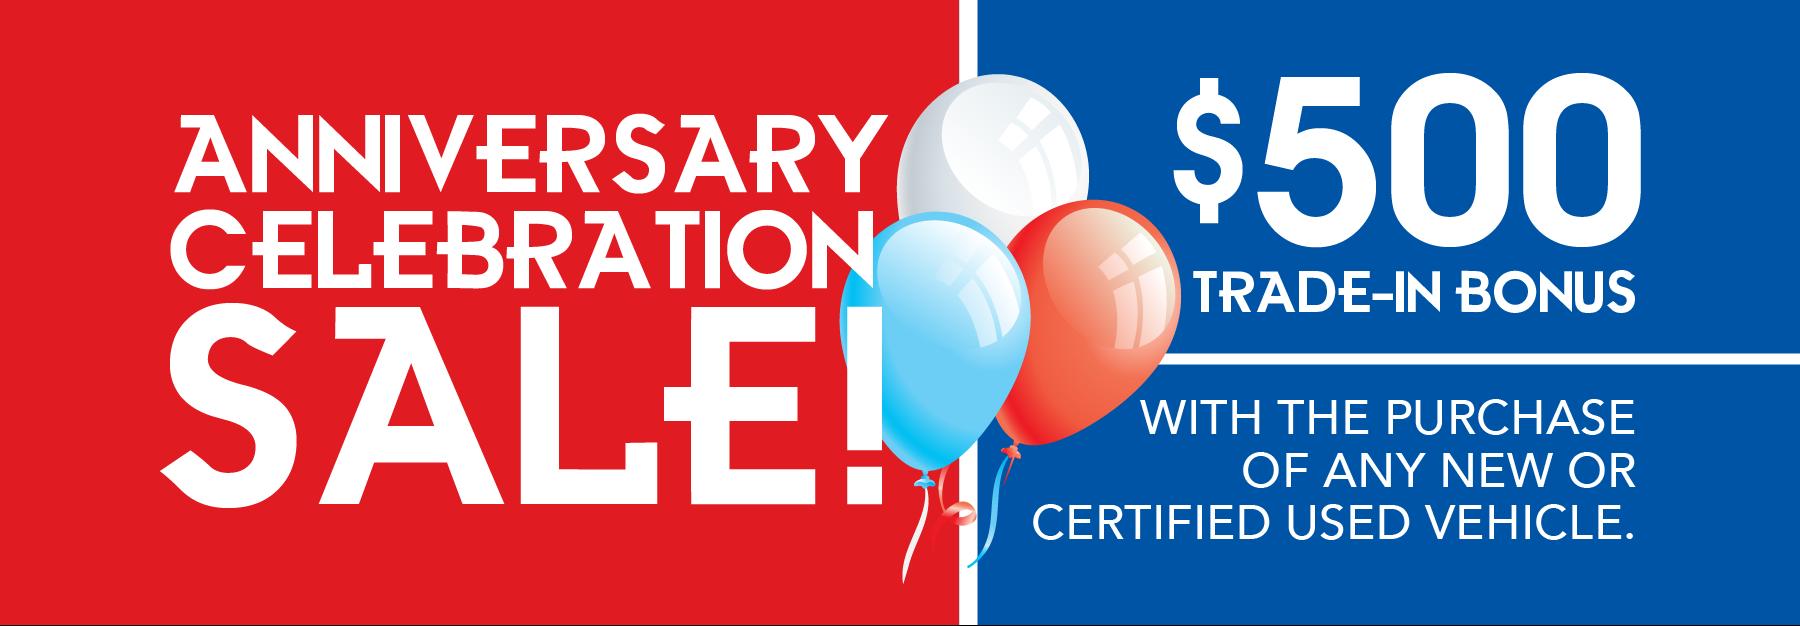 Anniversary Sale! $500 Trade-in Bonus!